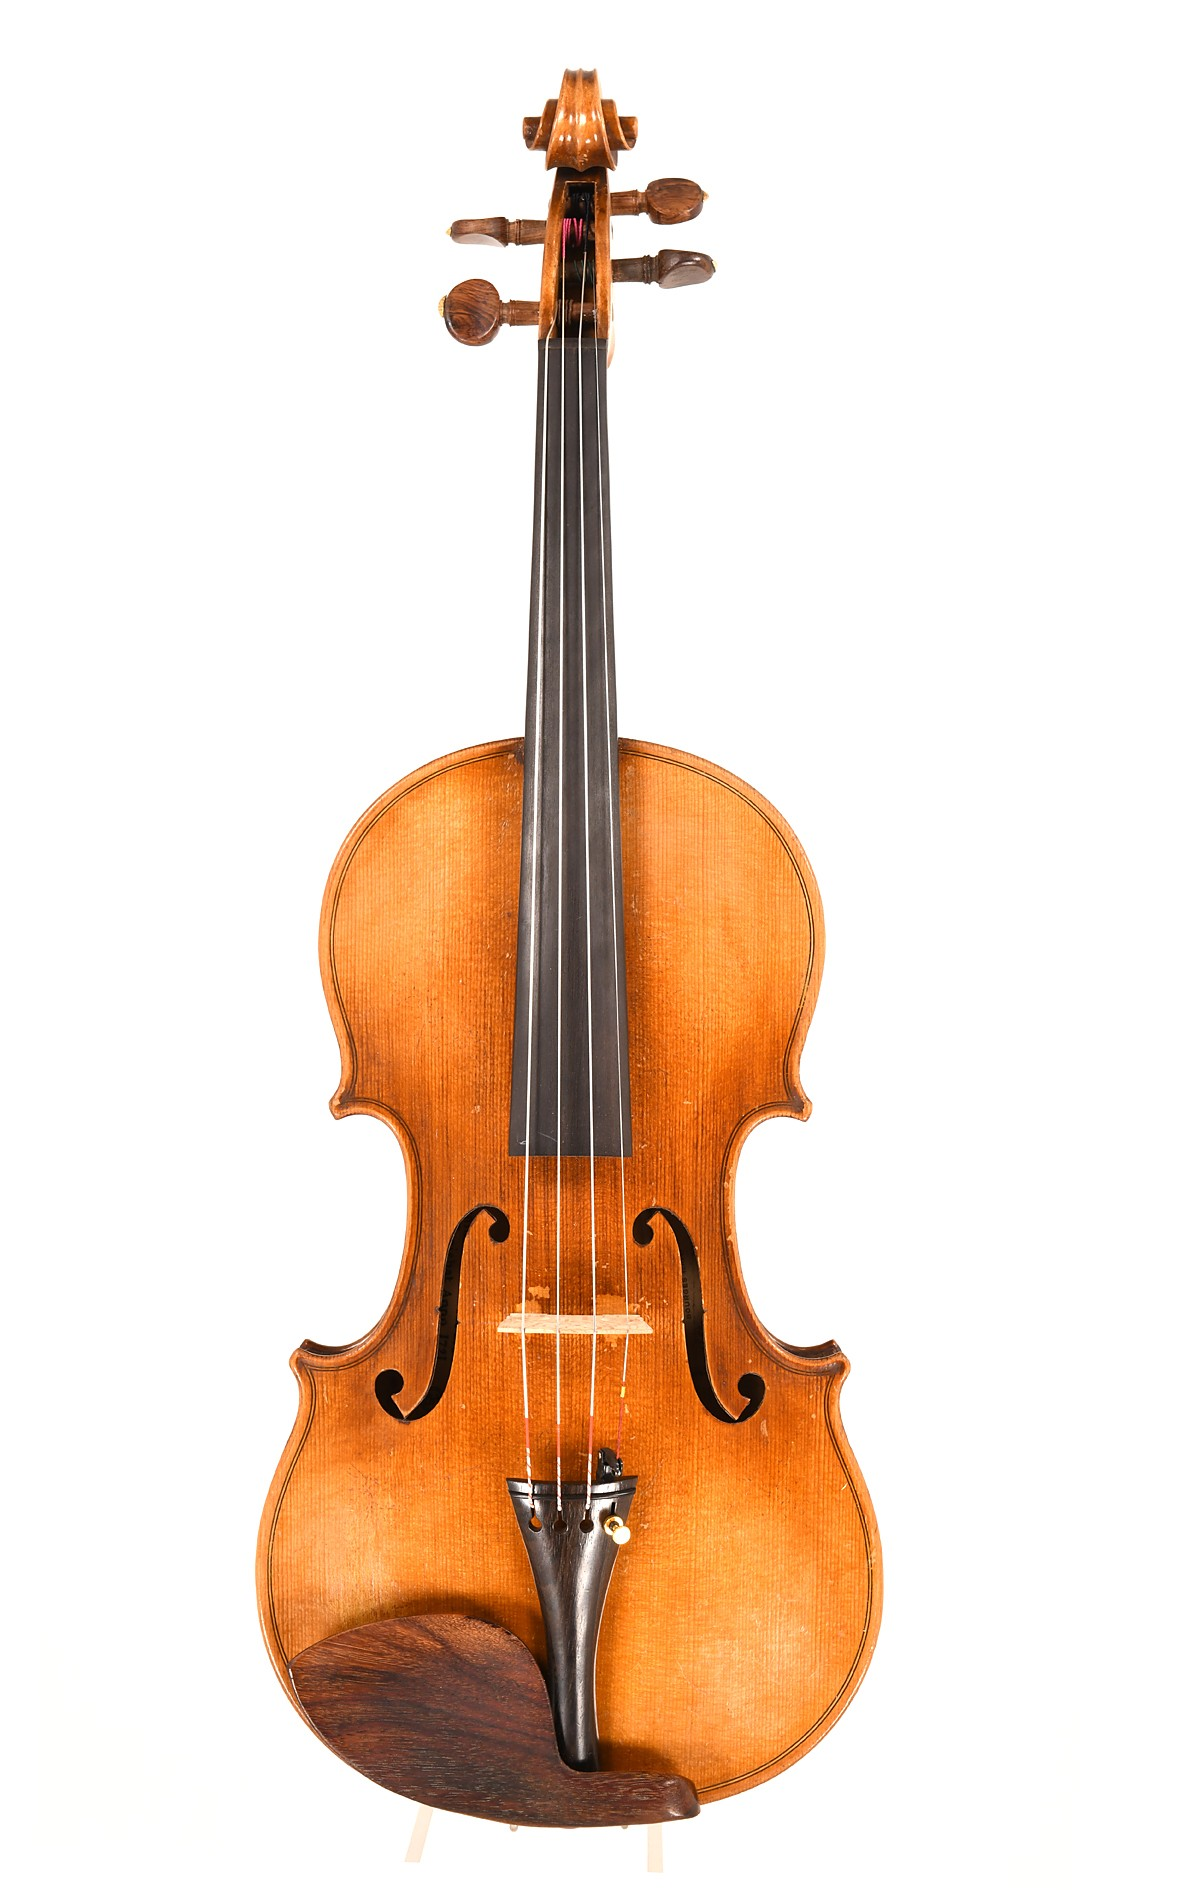 J.T.L. Paris violin - top view